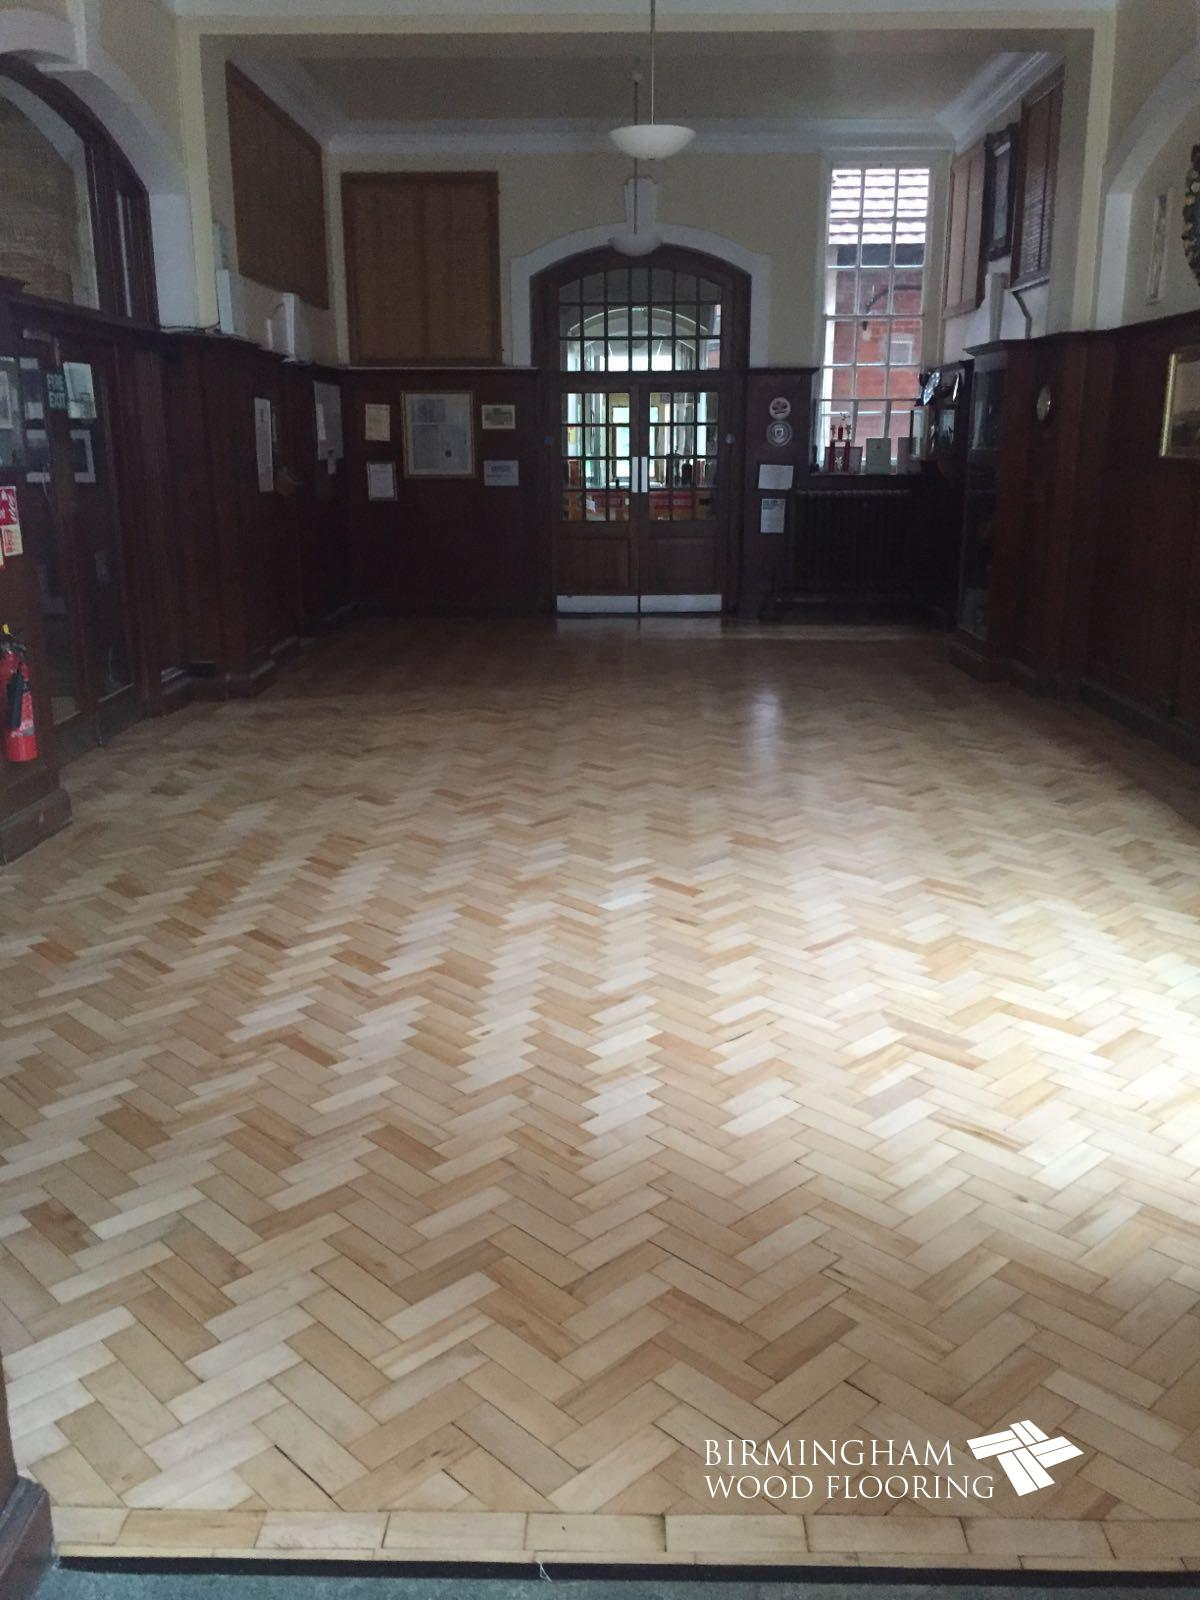 Wolverhampton-Girls-High-School-Completed